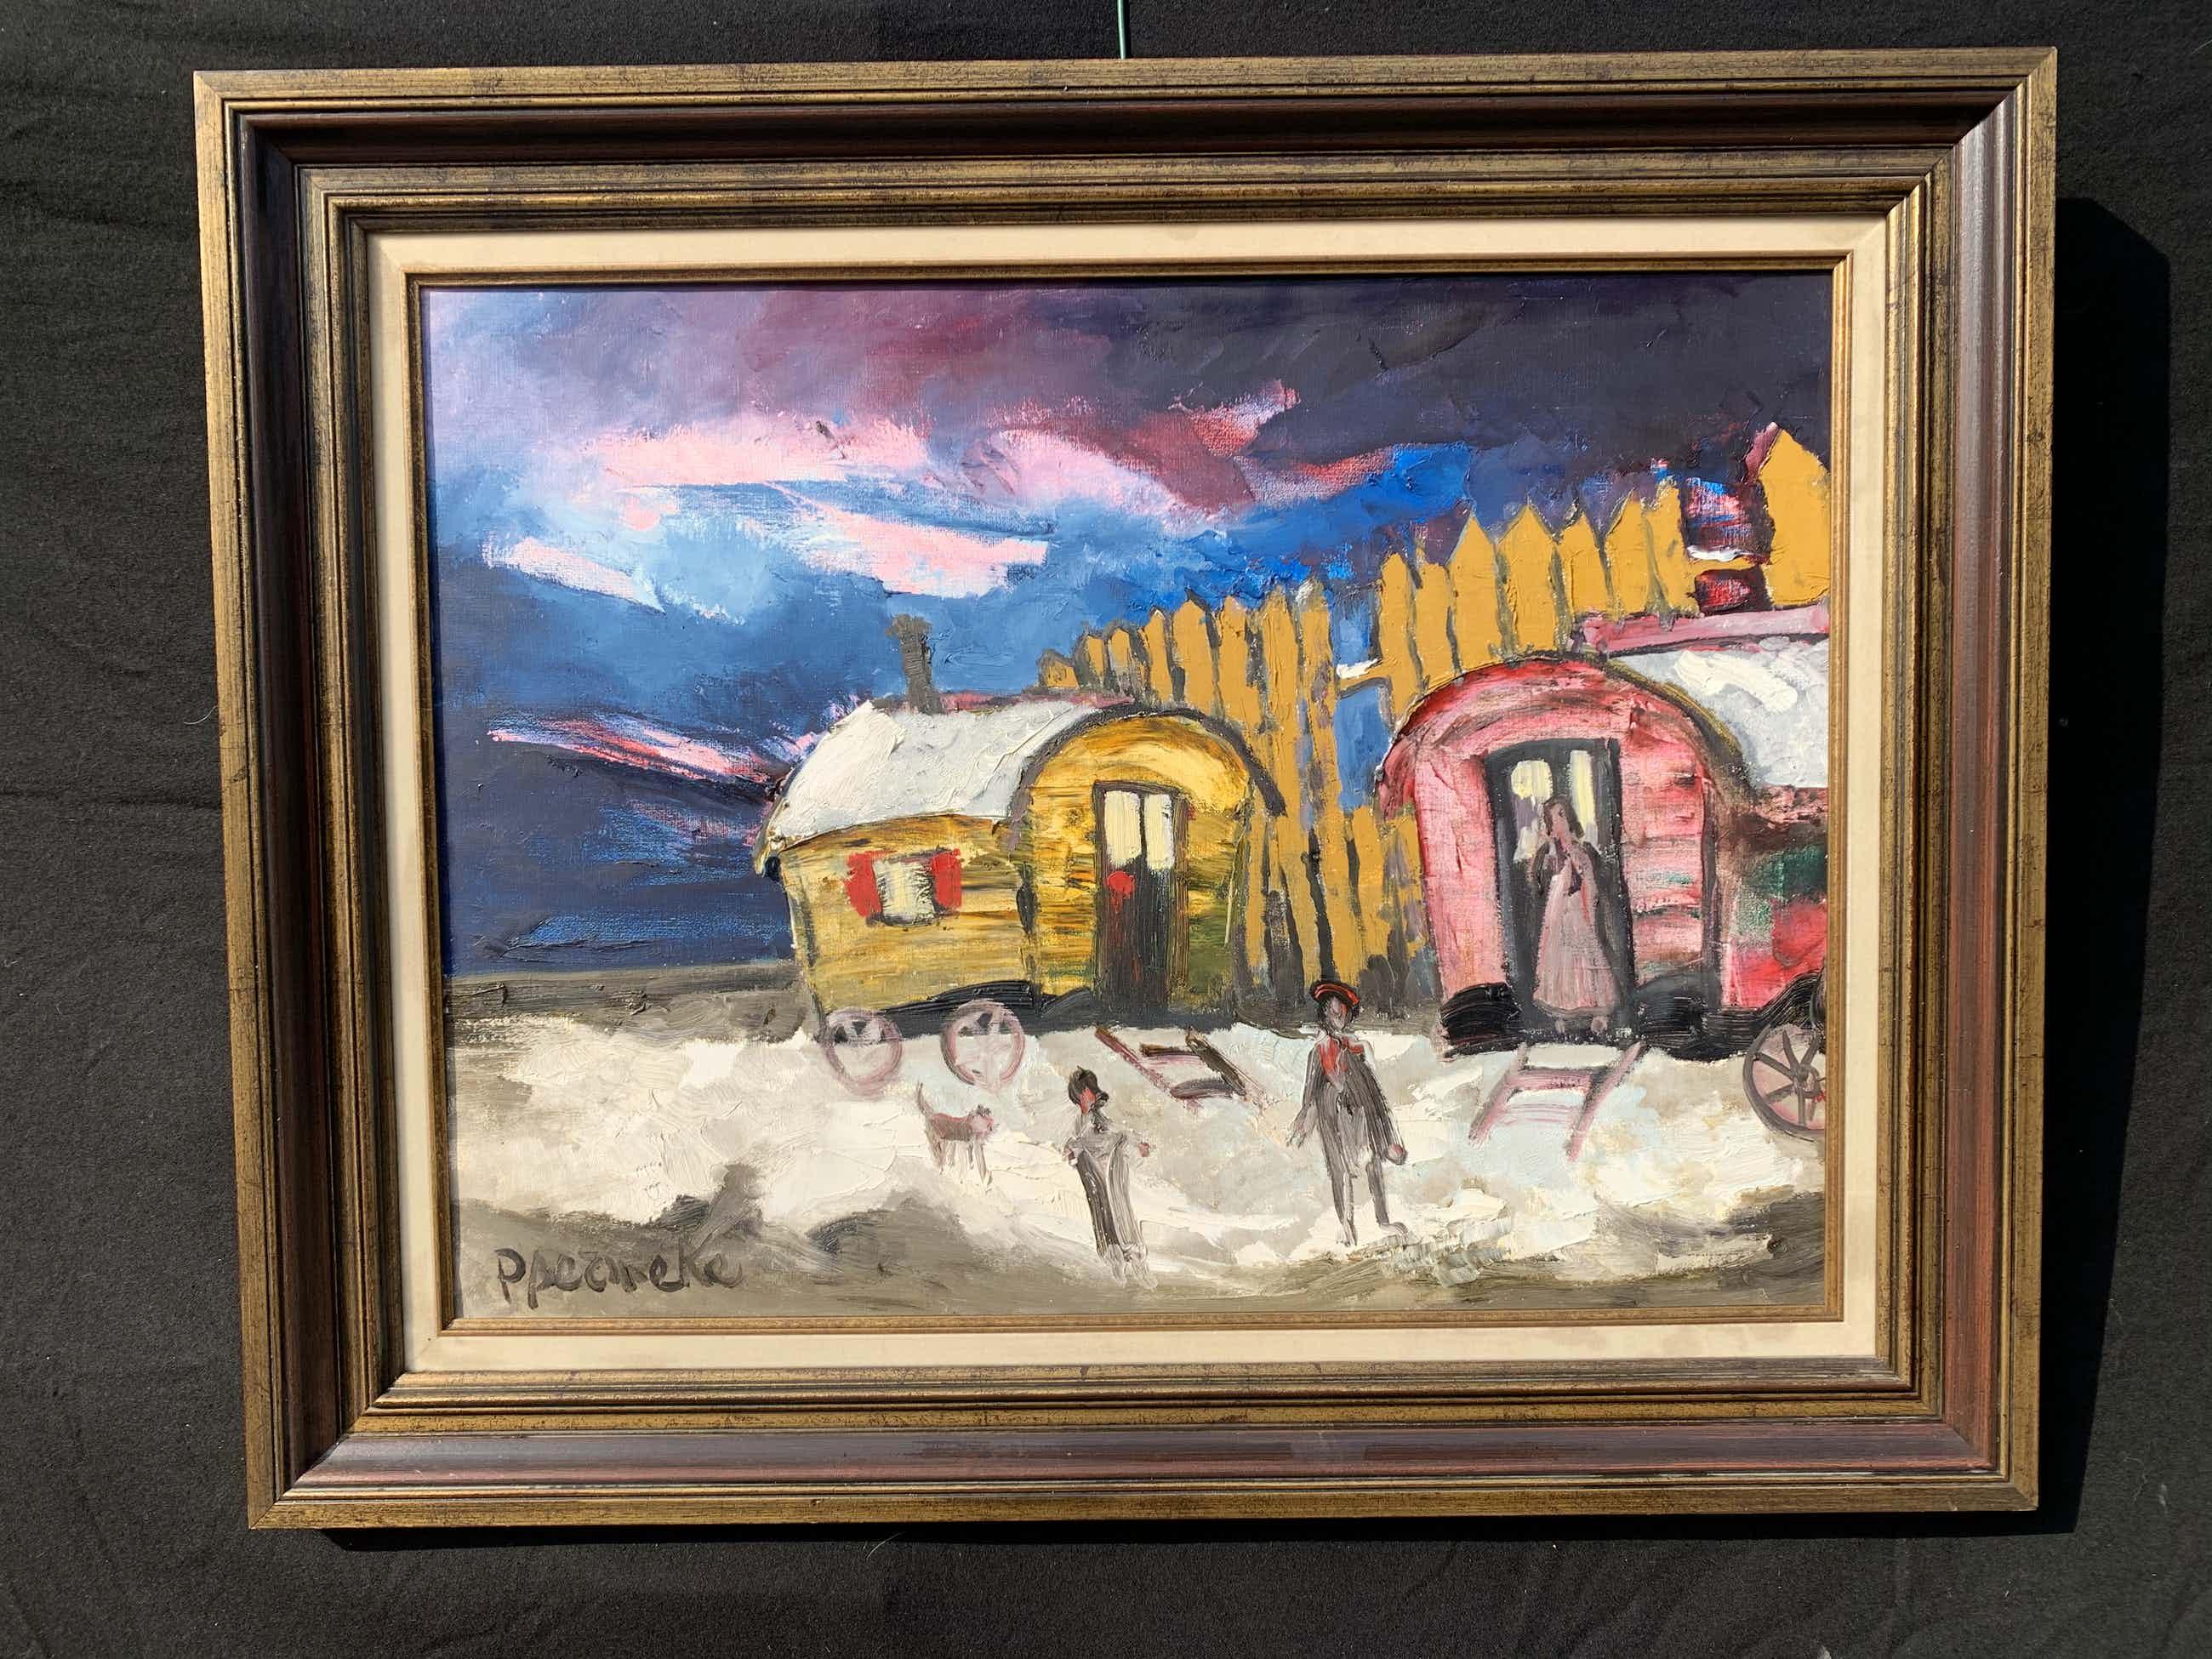 Paul Permeke - Olieverf schilderij: circus woonwagens kopen? Bied vanaf 590!